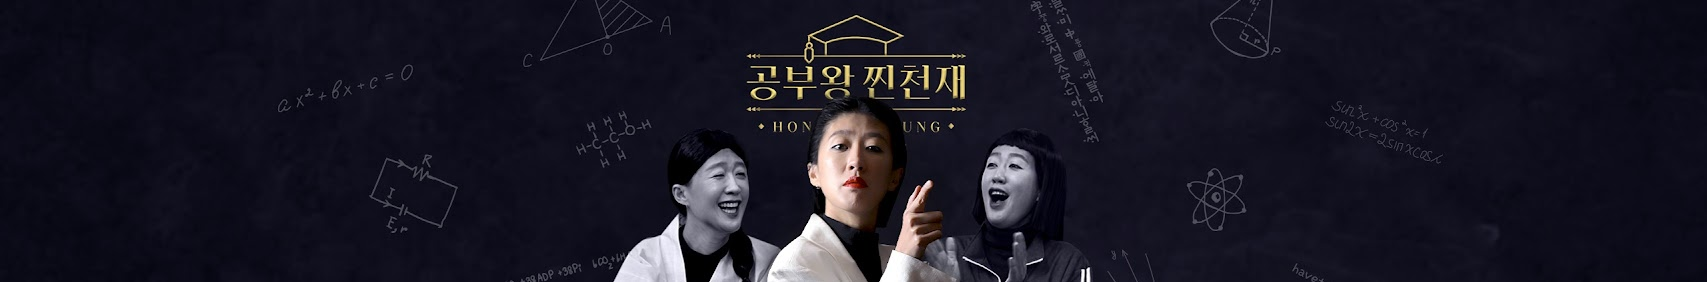 Hong Jin-kyung သည်ဥာဏ်ကြီးရှင်ကိုလေ့လာသောဘုရင်ဖြစ်သည်